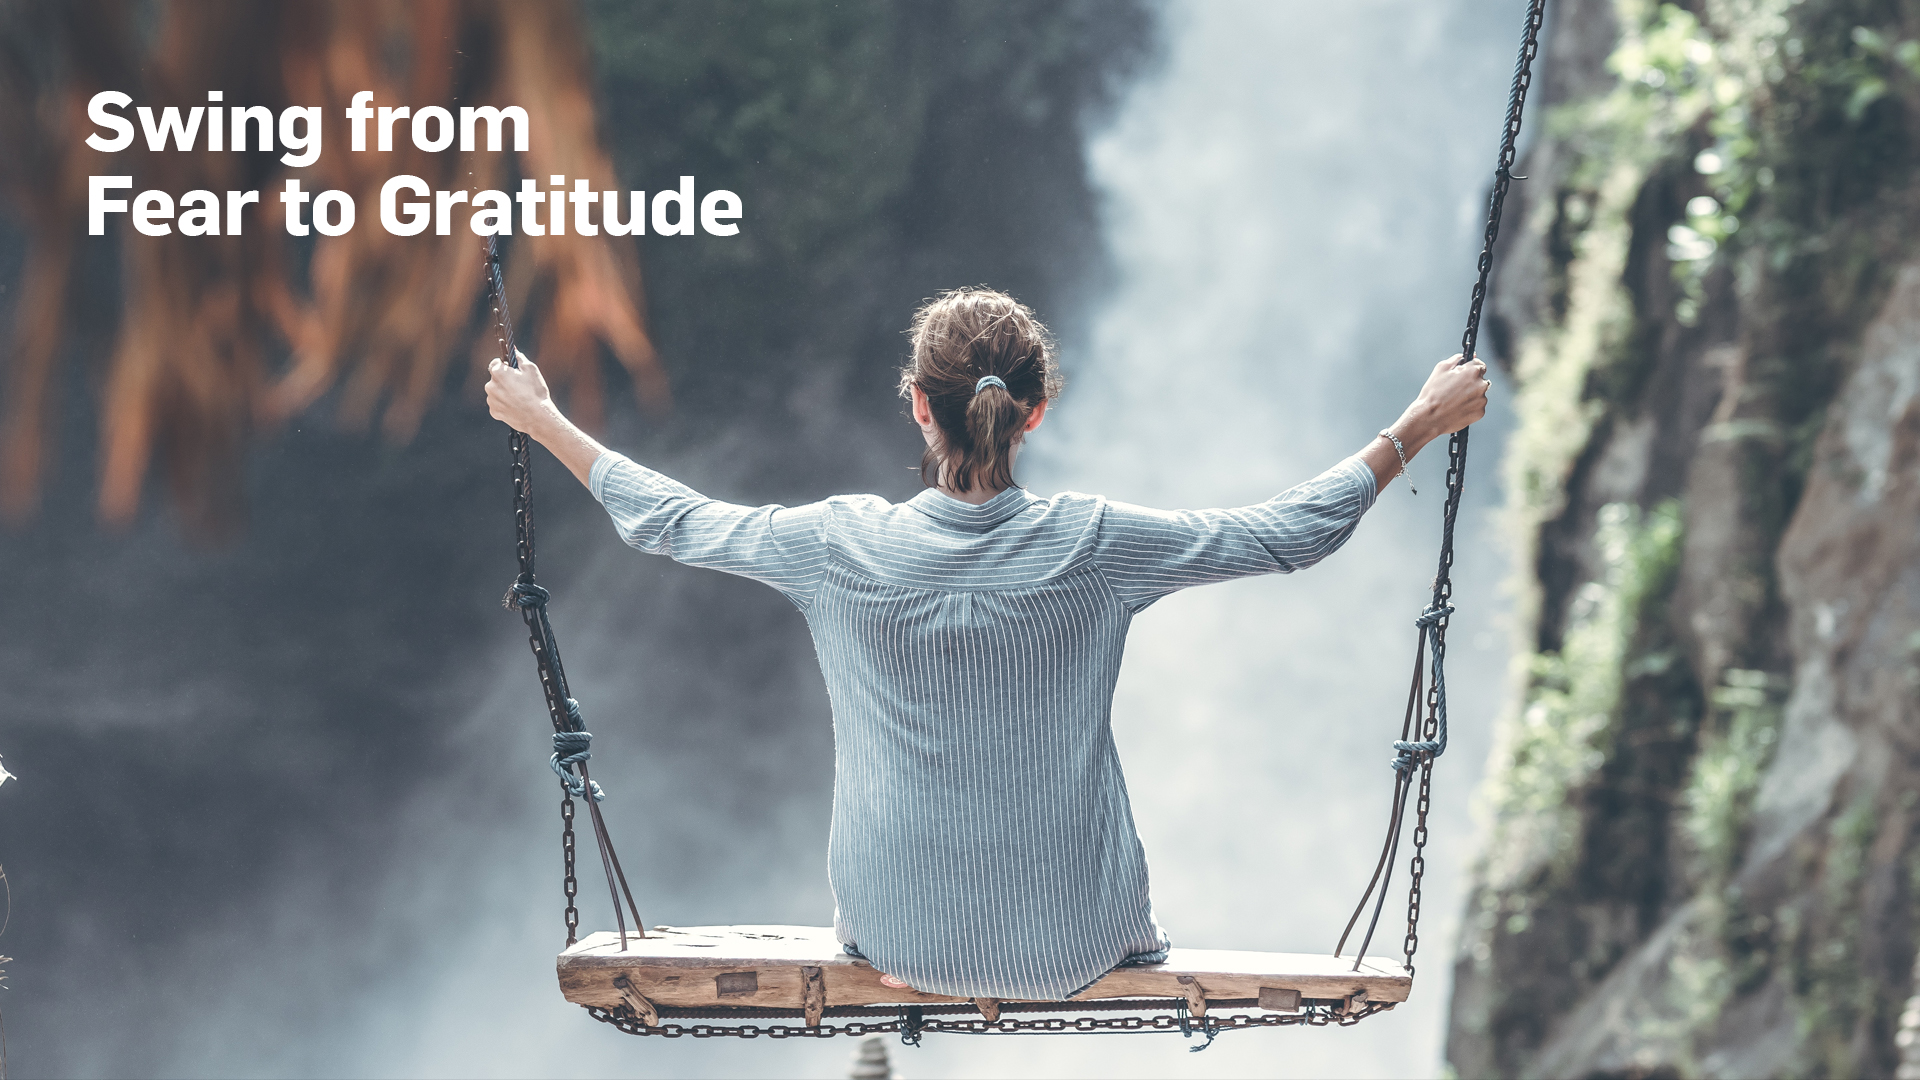 Swing from Fear to Gratitude 1920x1080.jpg